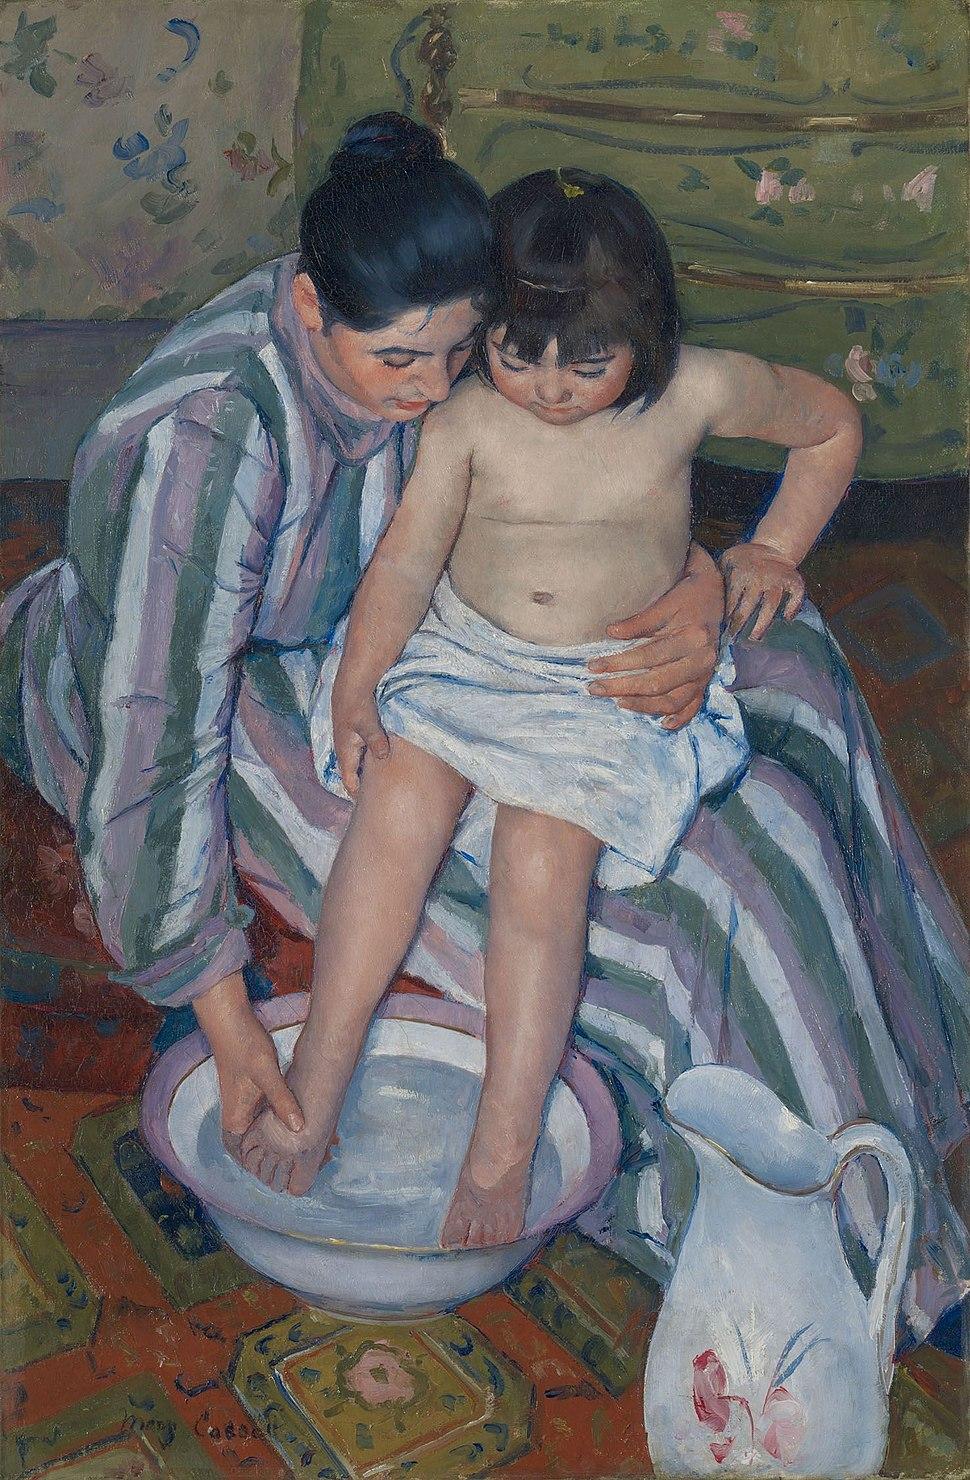 The Child's Bath by Mary Cassatt 1893